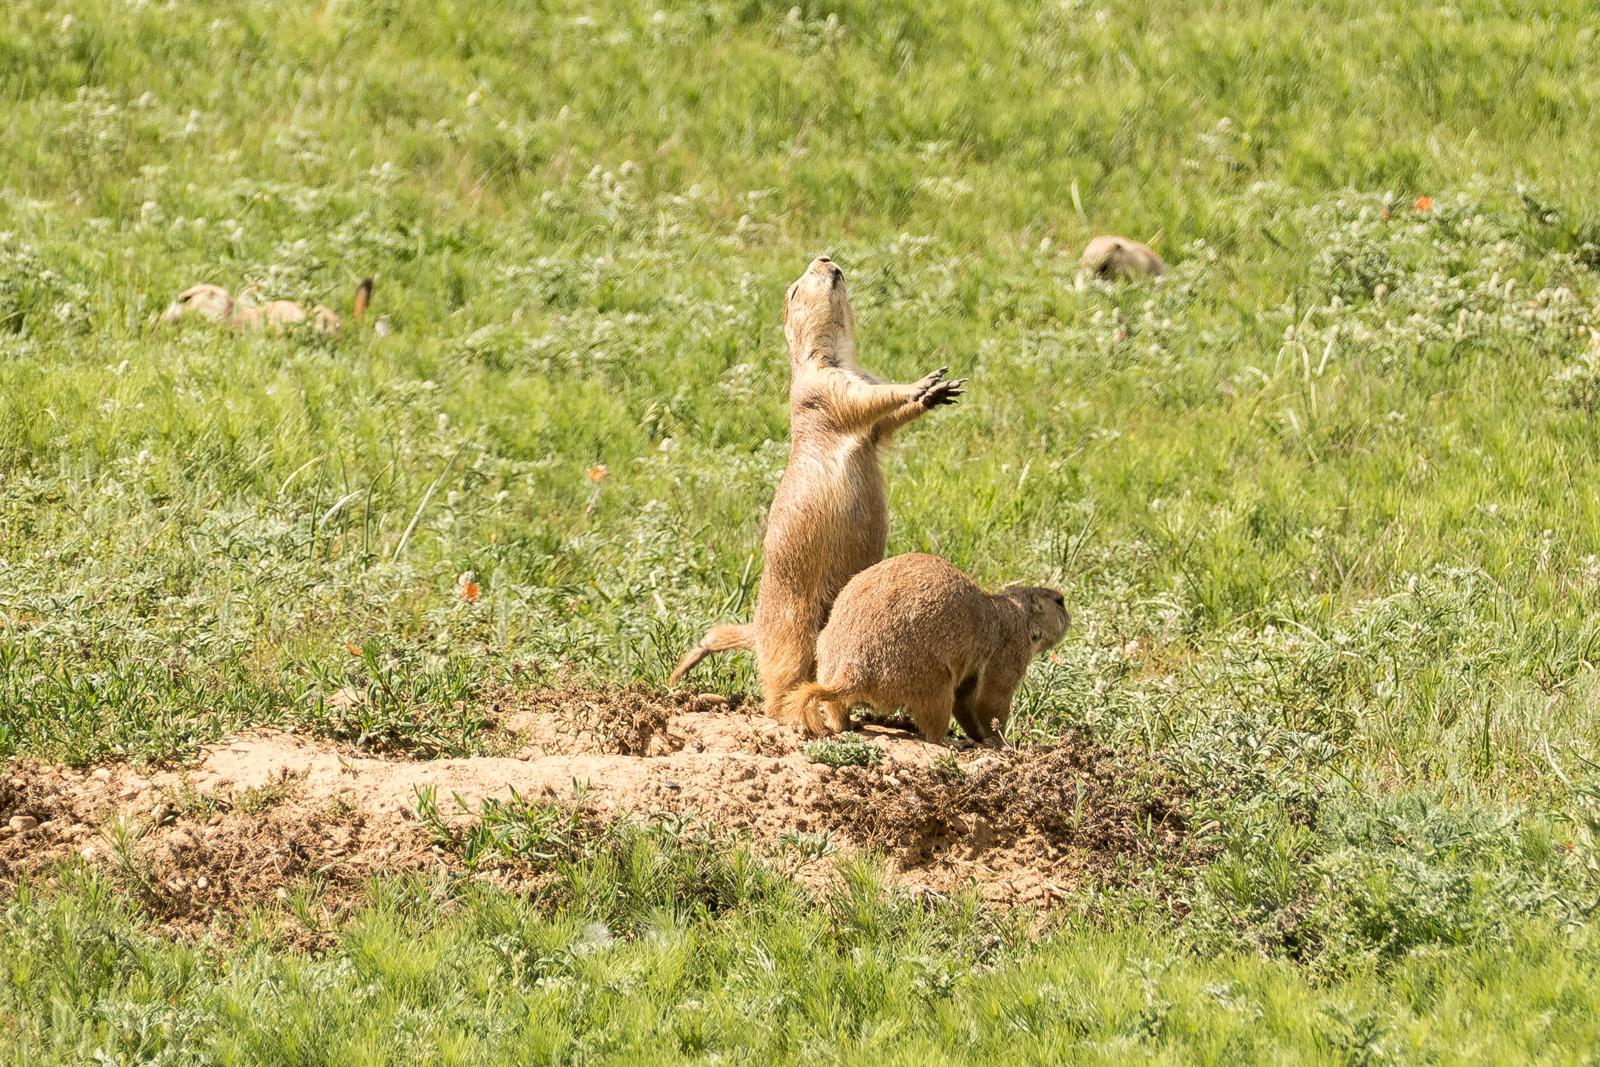 Prairie dog in mid-call